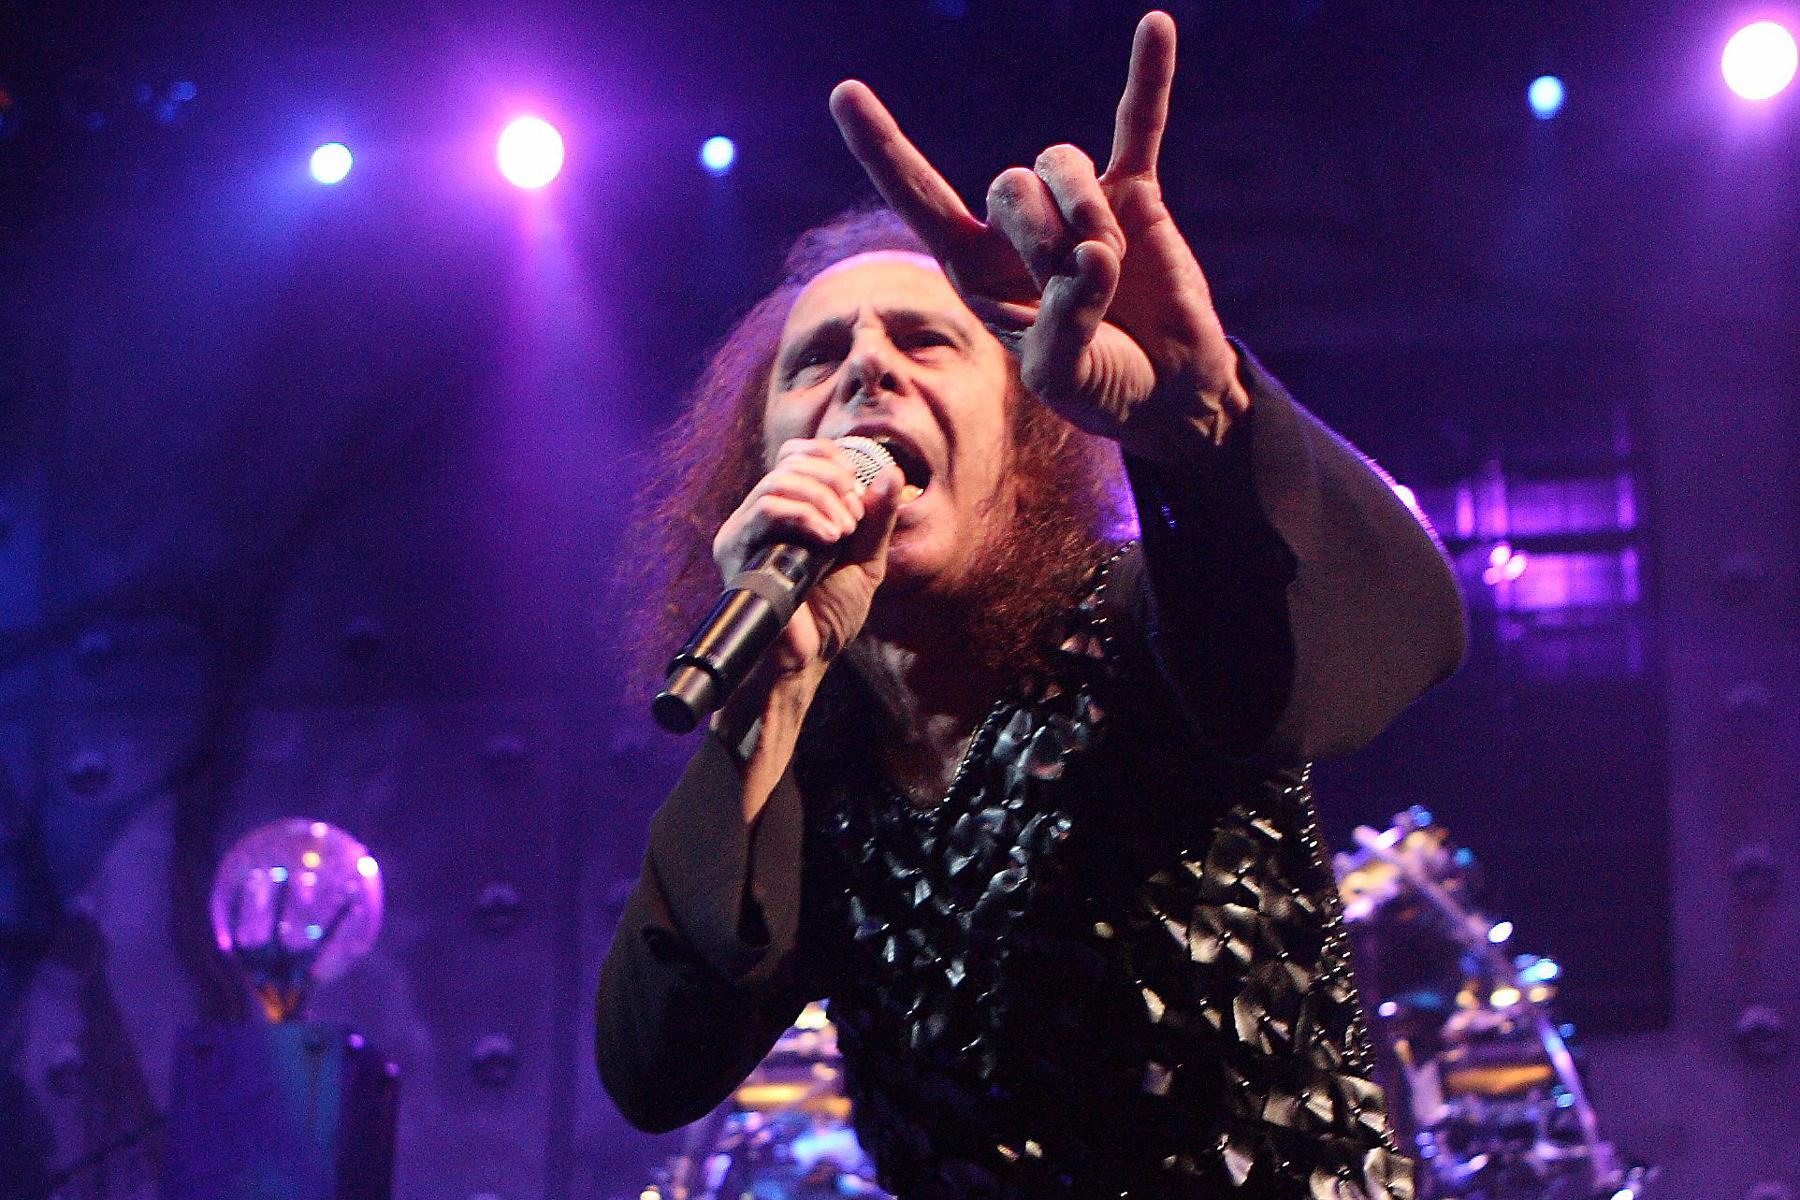 Ronnie James Dio Hologram to Tour U.S. With Dio Bandmates